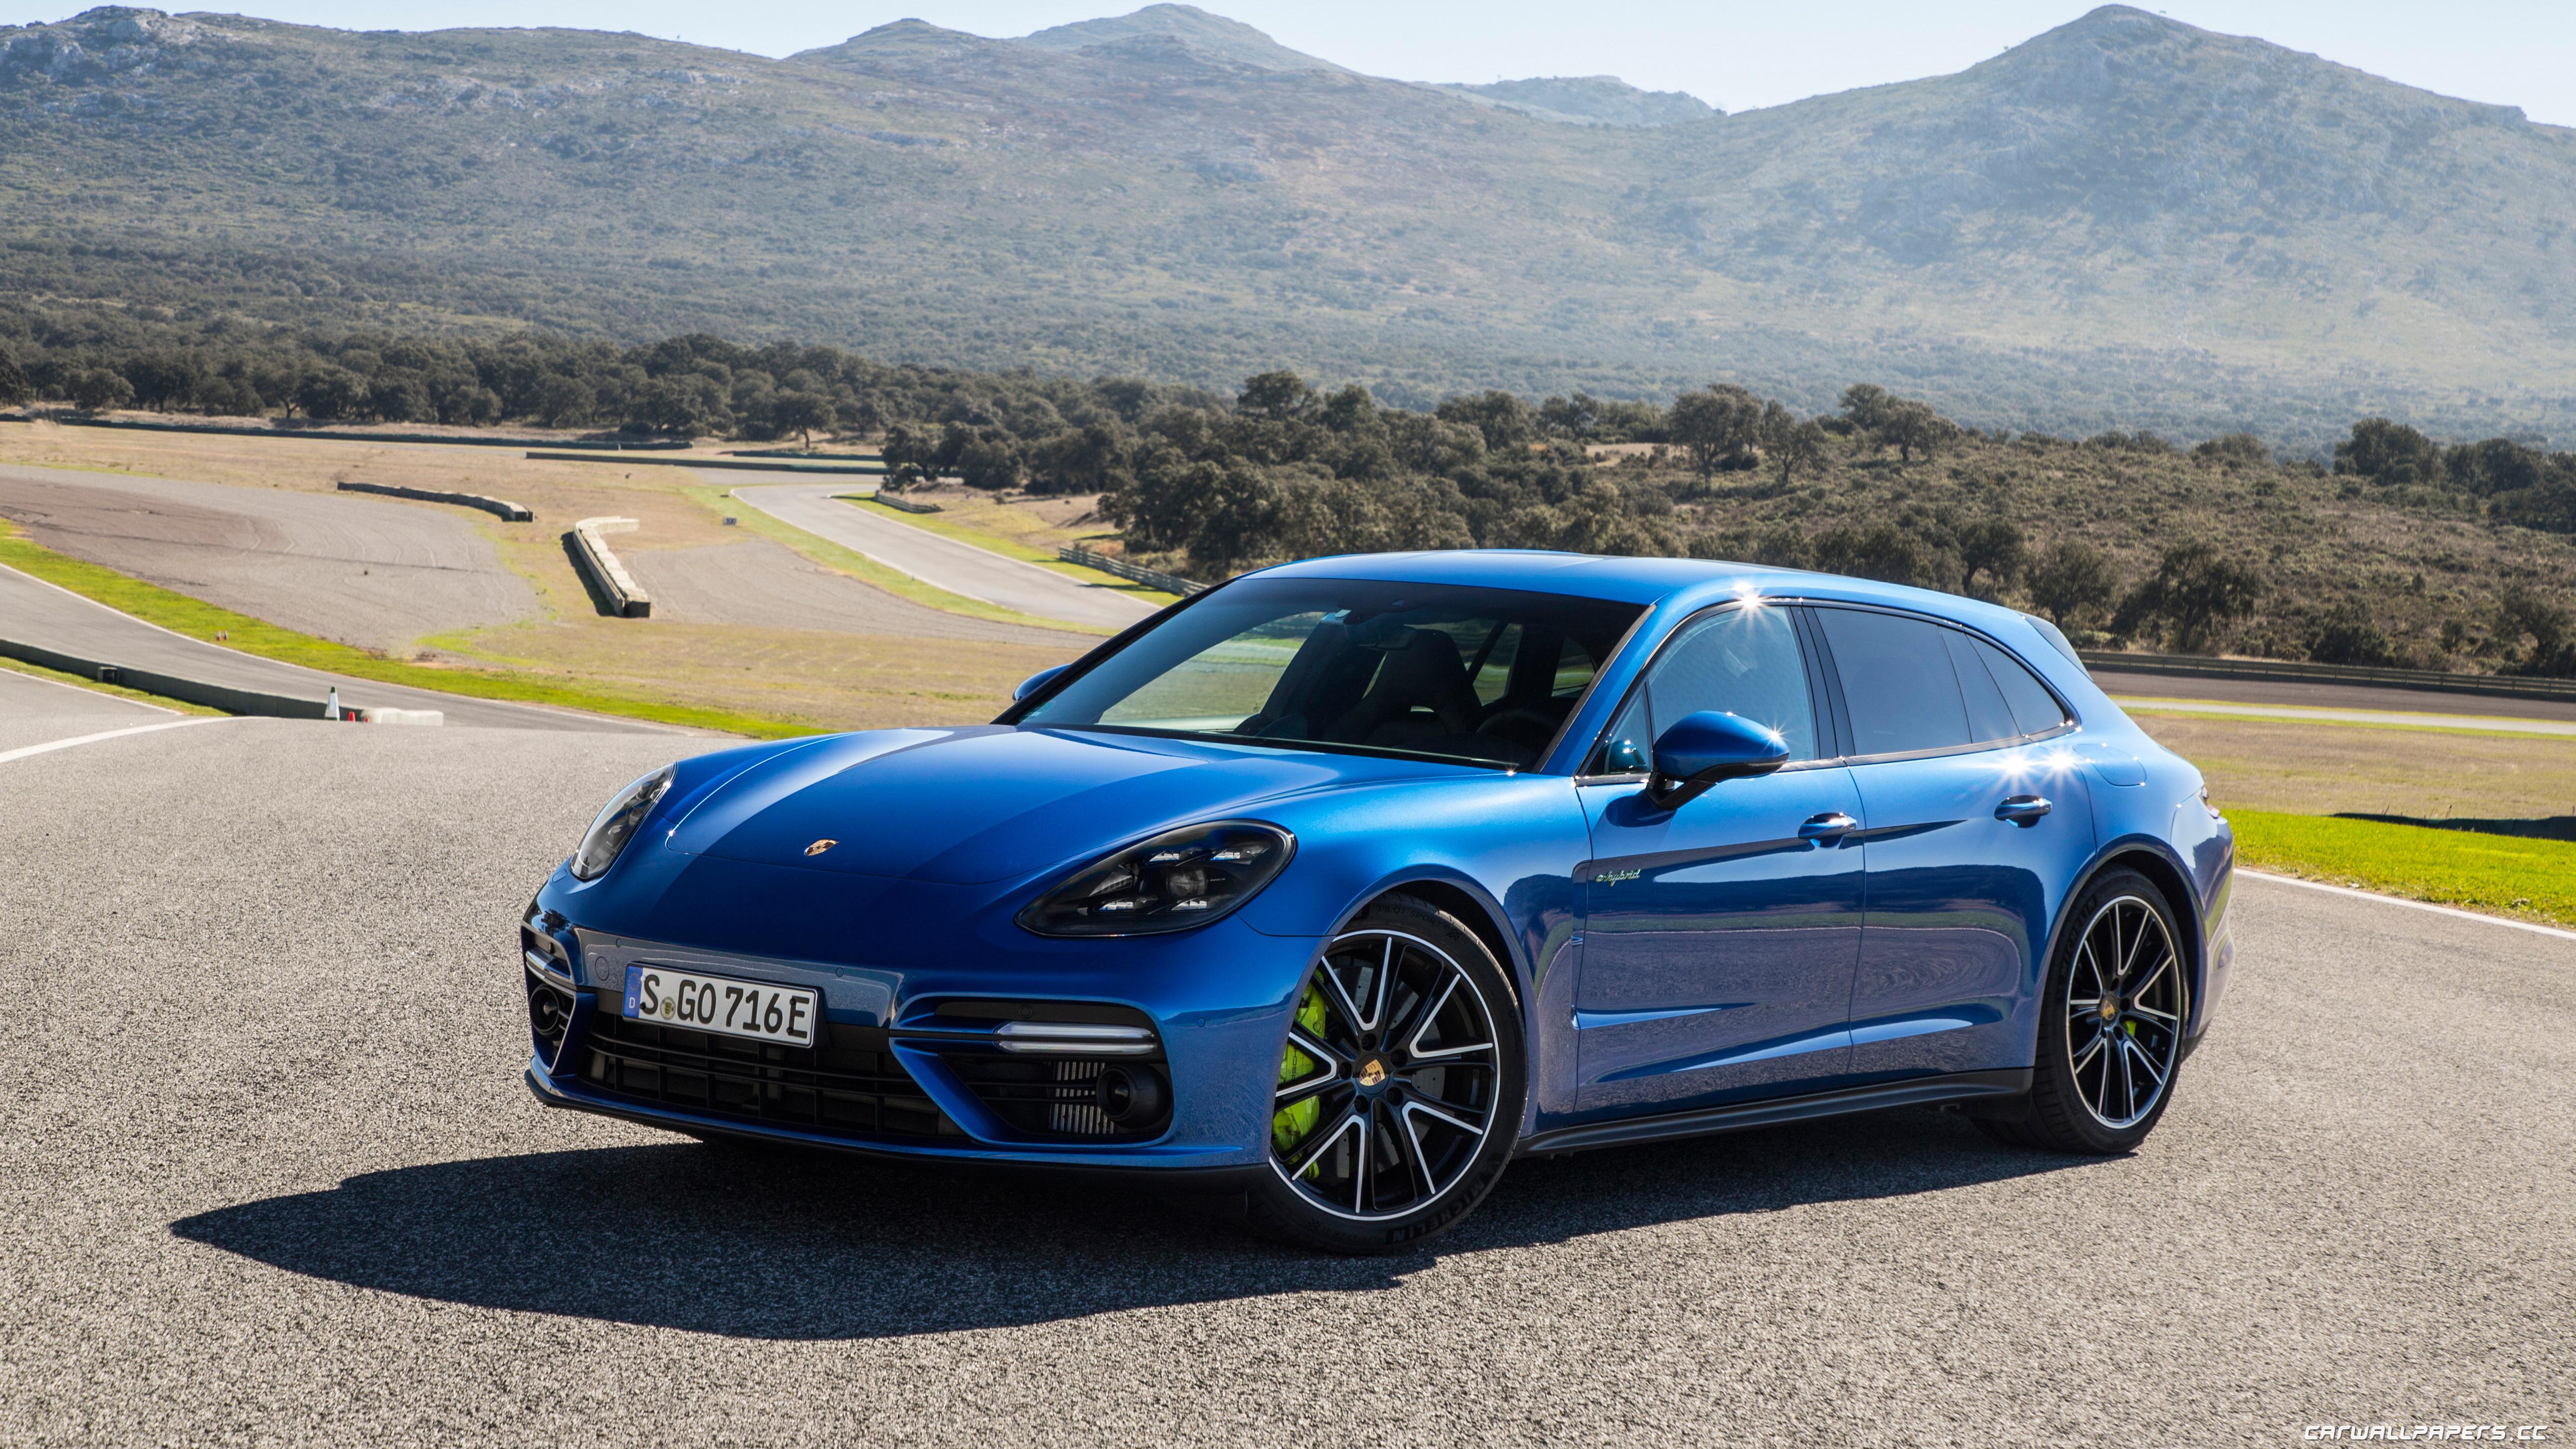 Cars Desktop Wallpapers Porsche Panamera Turbo S E Hybrid Sport Turismo Sapphire Blue Metallic 2017